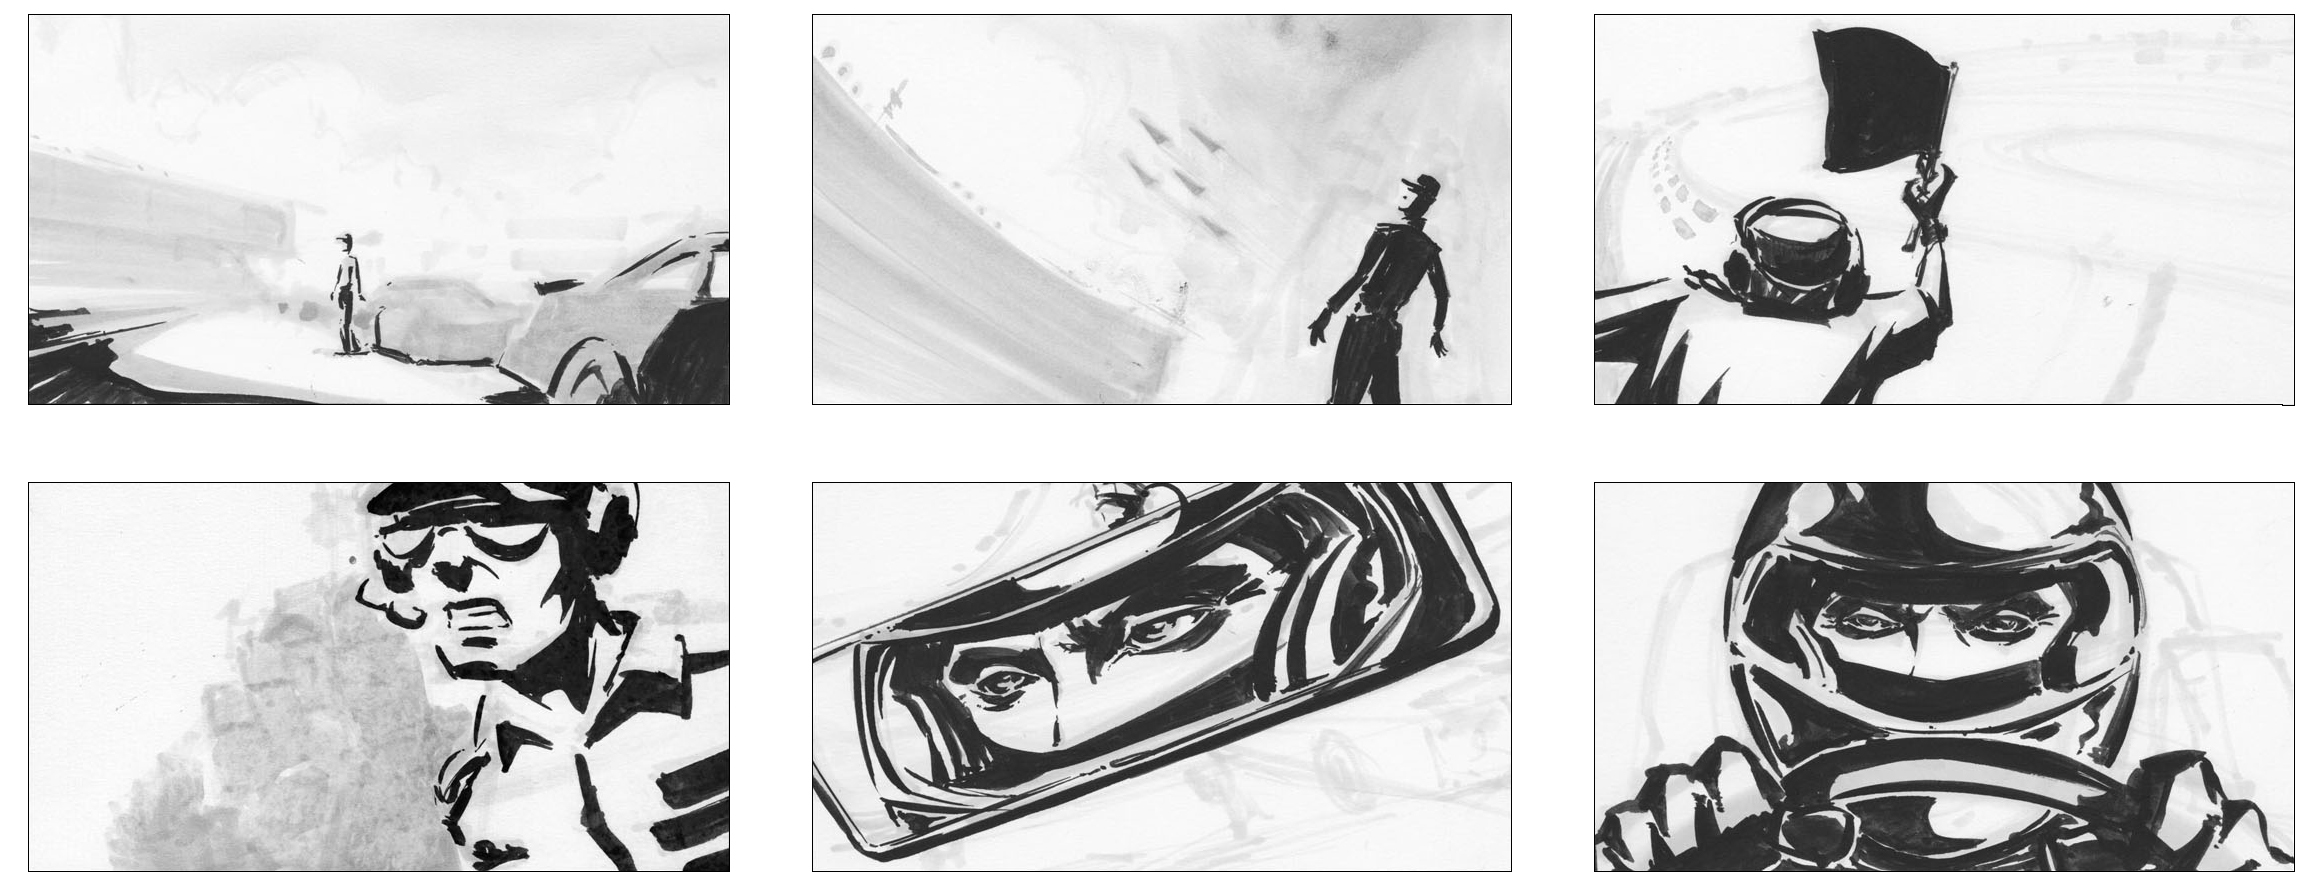 The Art of Jeremy Rumas_Jeremy Rumas Storyboards_NYC_television_commercial storyboards_ink and brush_Nascar_b_www_jeremyrumas_com.jpg